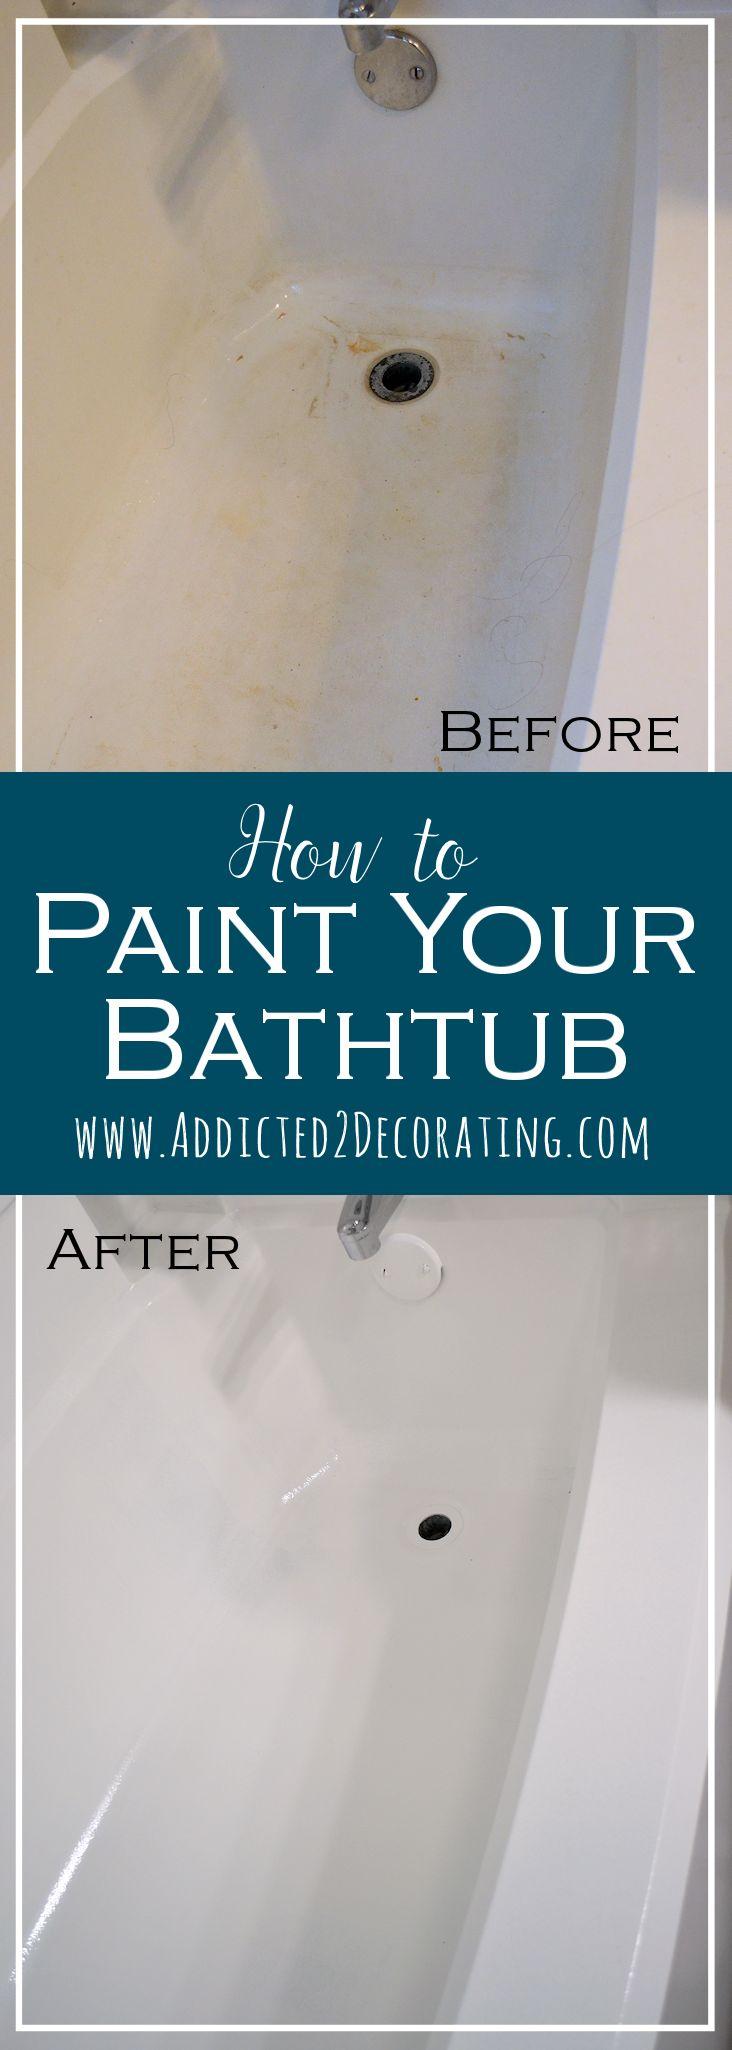 Amazing Tub Paint Big Paint Bathtub Rectangular Tub Refinishers Can I Paint My Bathtub Youthful Paint A Tub Gray Paint For A Bathtub